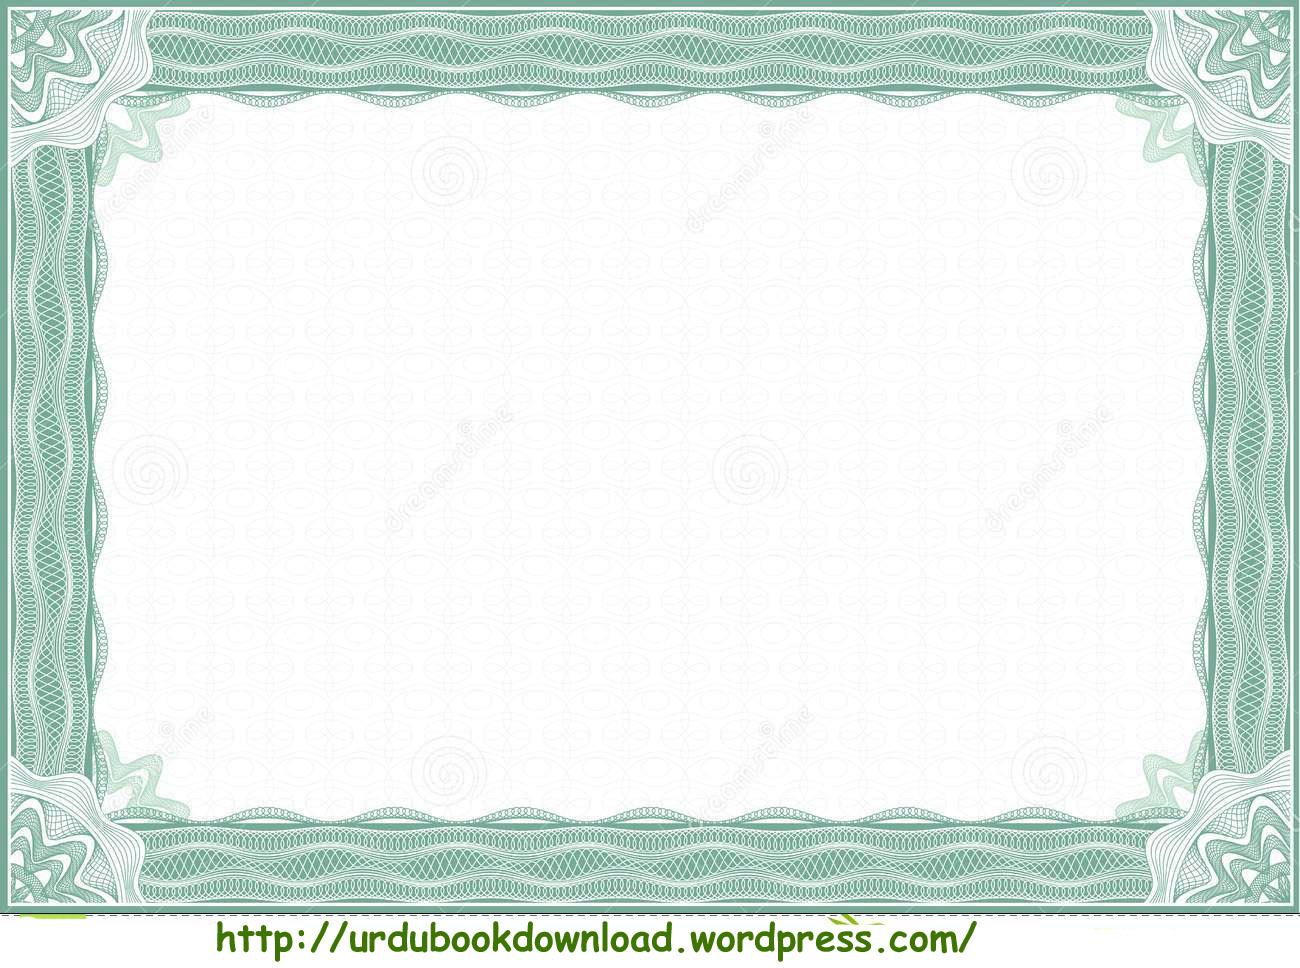 Vector diploma certificate border | QURAN ACADEMY ISLAMABAD